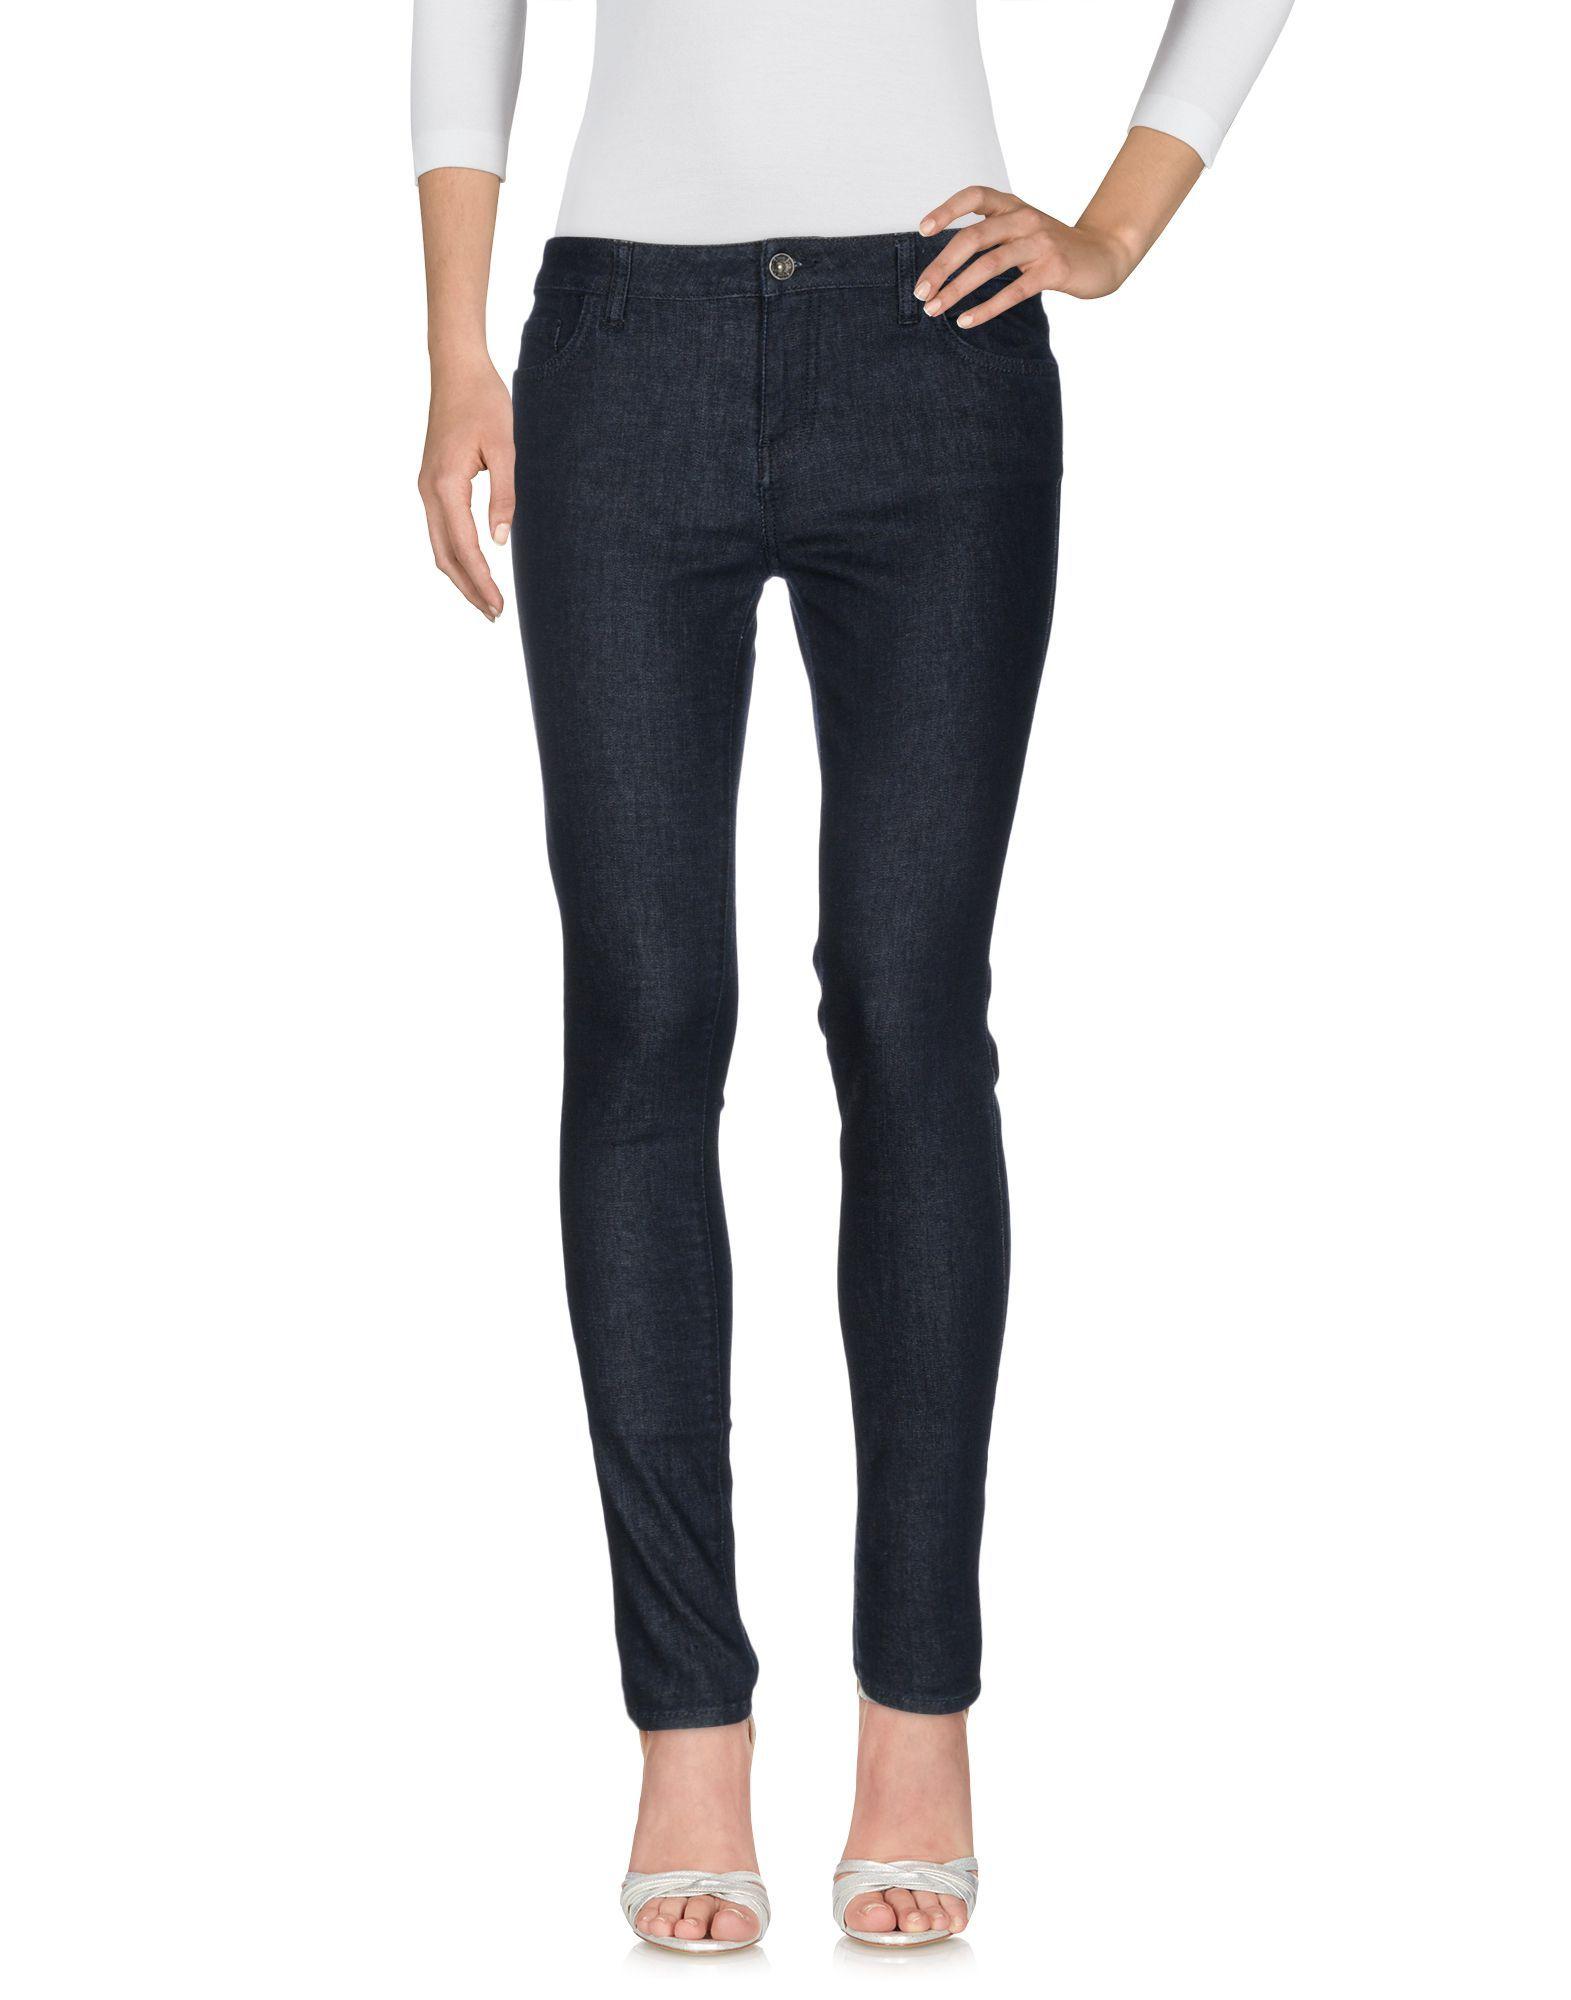 Vans Blue Cotton Skinny Jeans